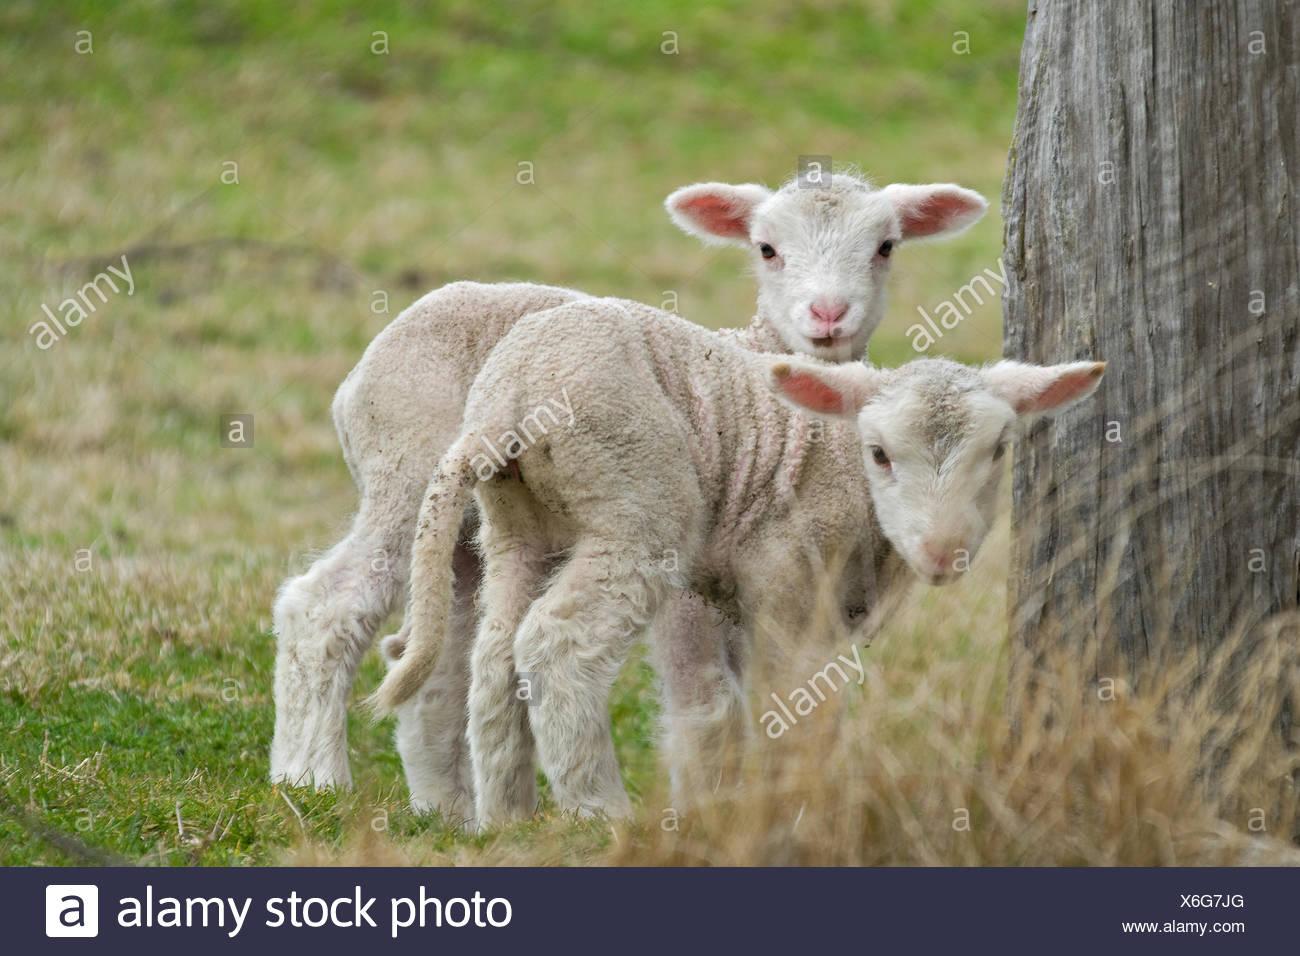 animals sheep farm - Stock Image